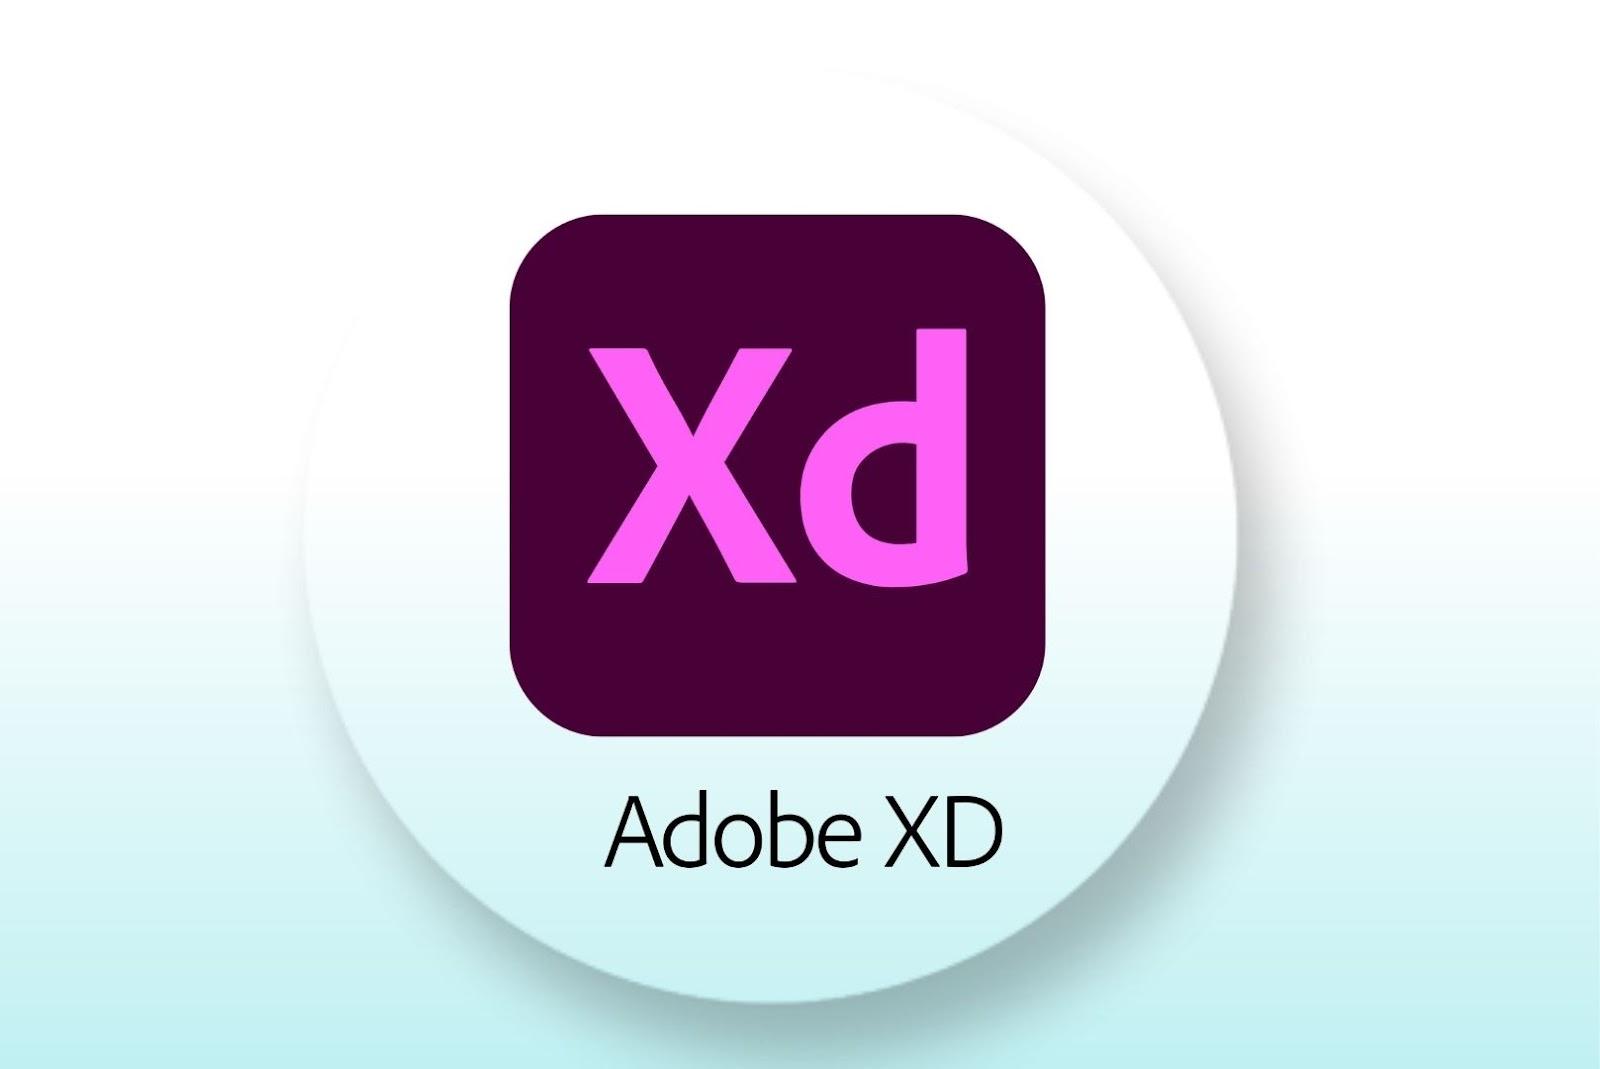 Adobe XD flutter app development tools